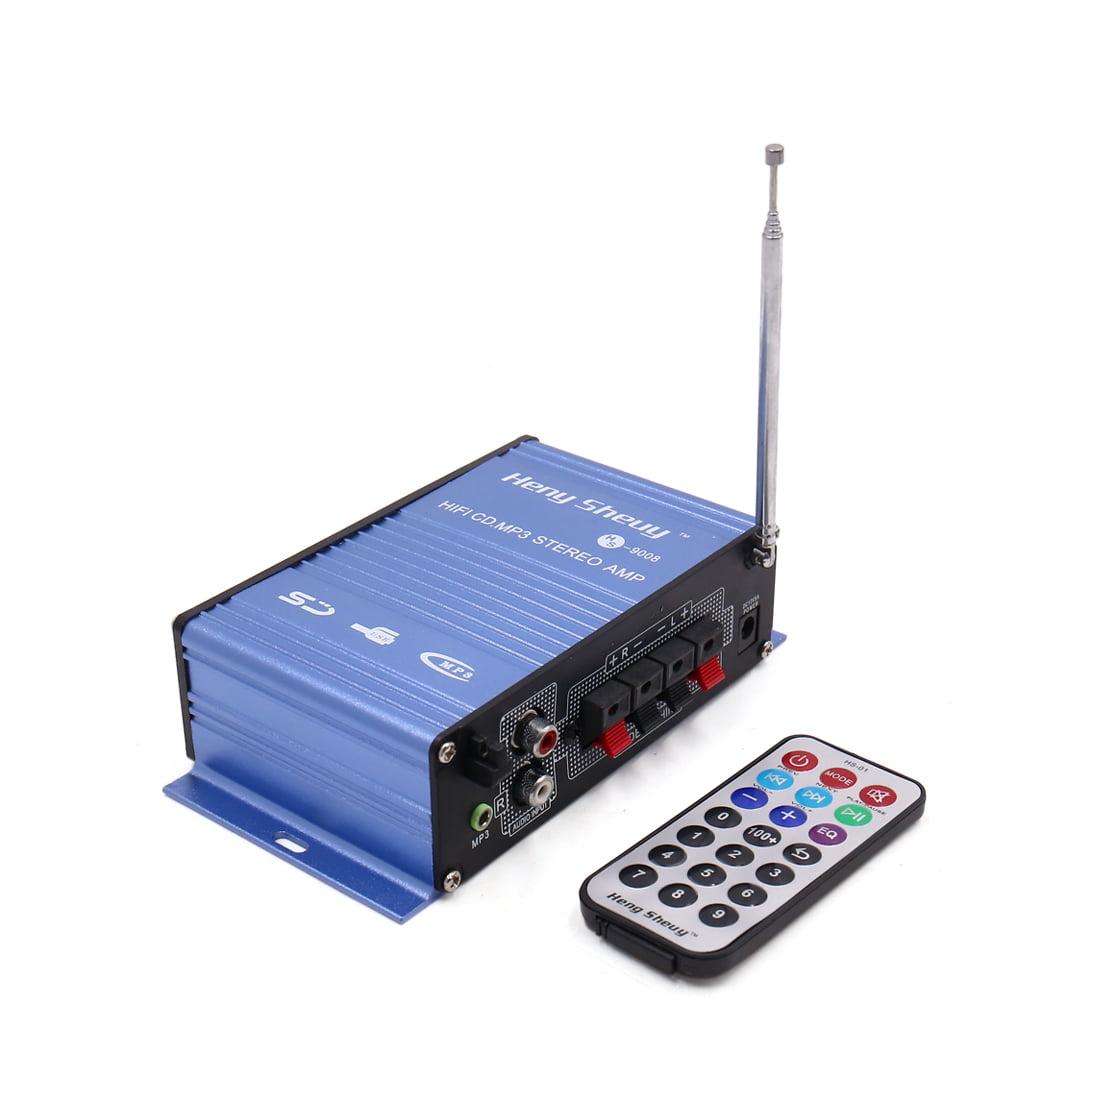 12V 2 Channel  Digital  HiFi Audio Stereo Amplifier for Car